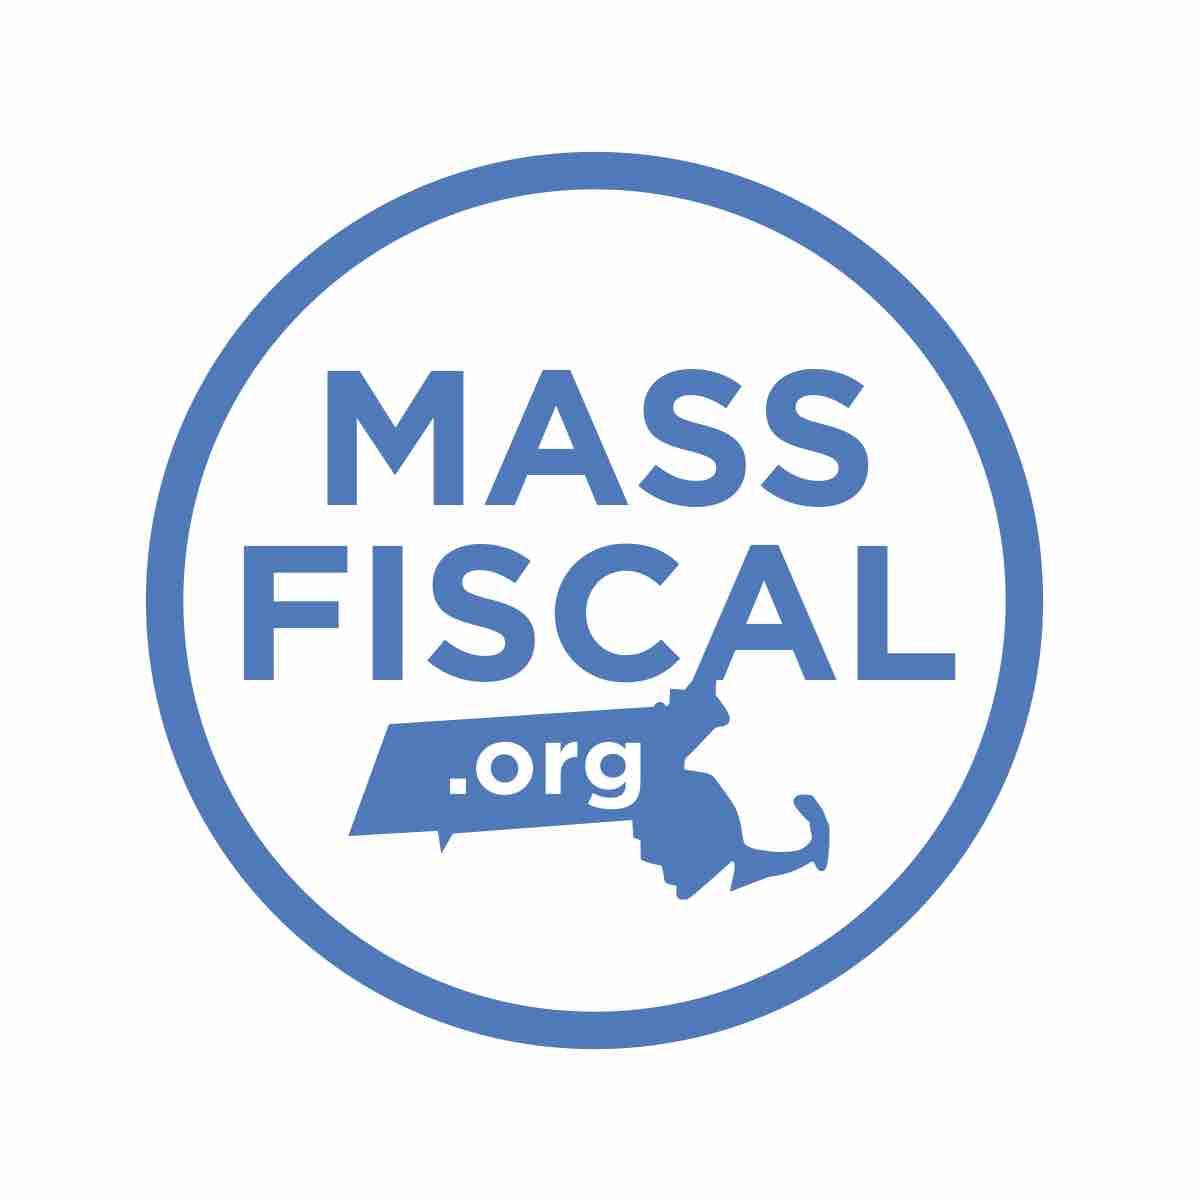 MassFiscal